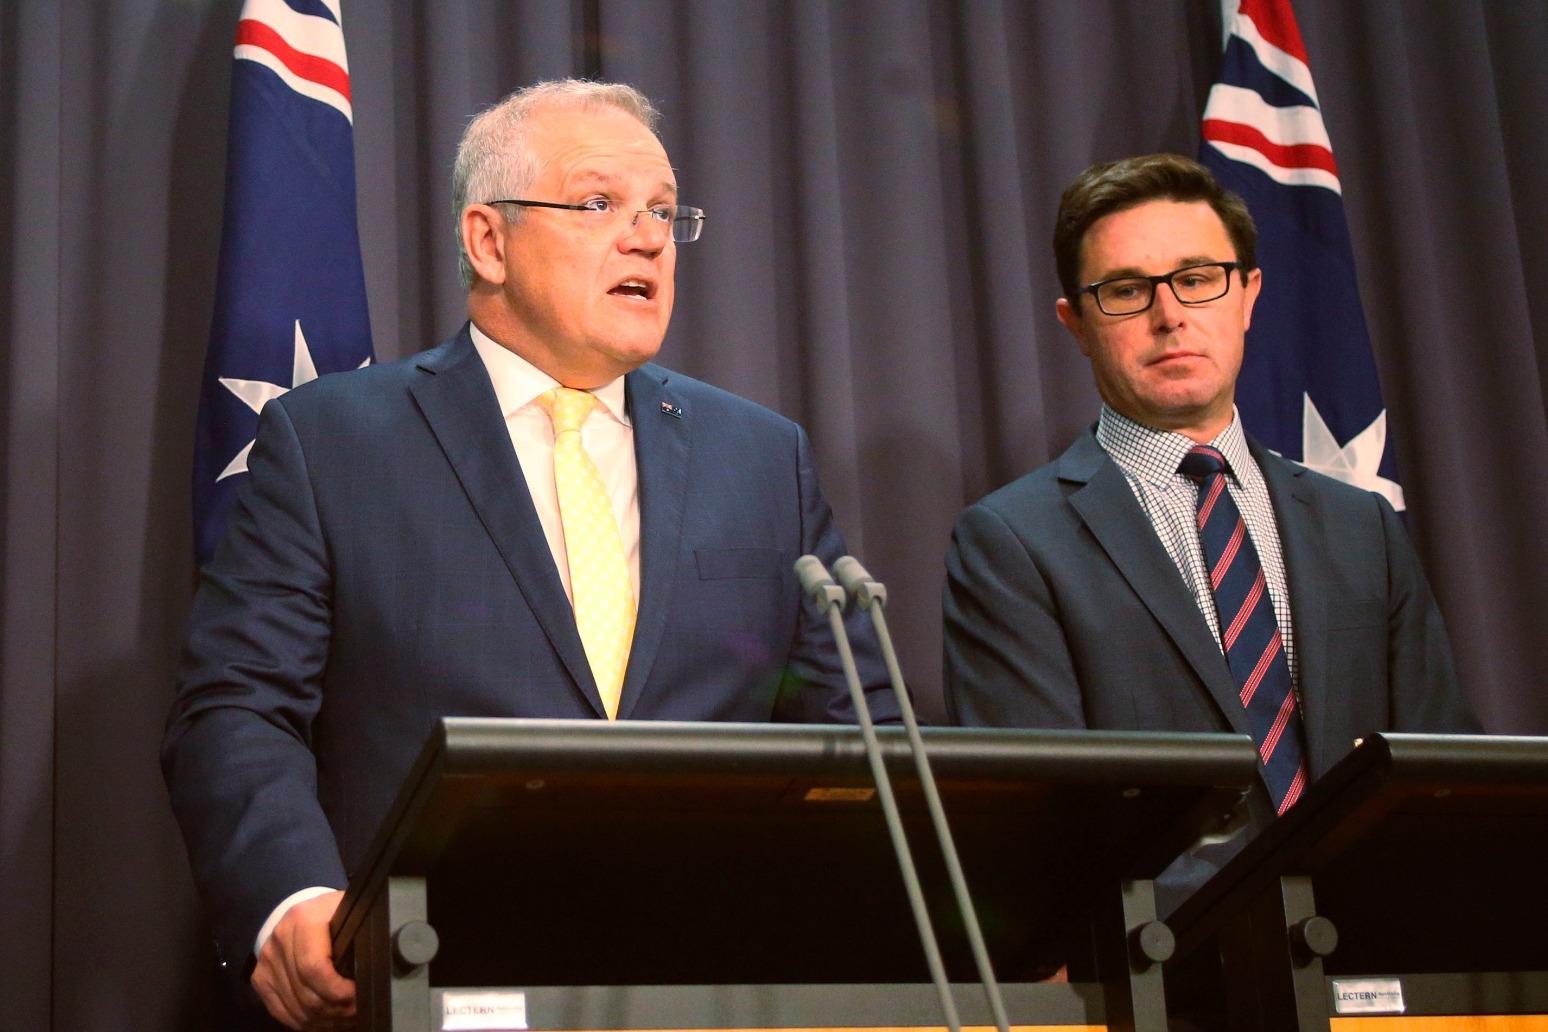 AUSTRALIANS BRACE FOR ESCALATING FIRE DANGER IN SOUTH-EAST